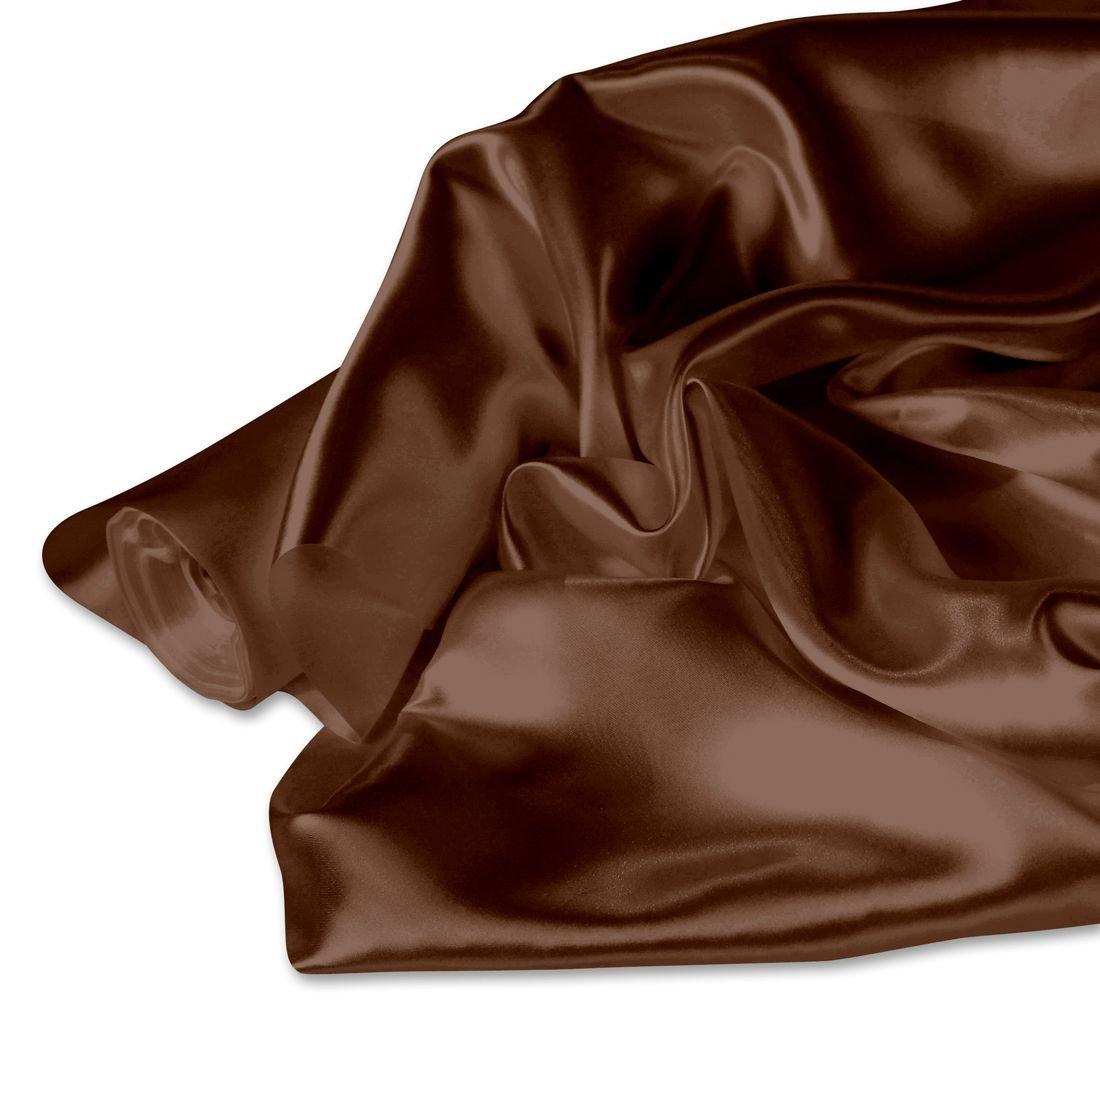 58 in. x 40 yd. Satin Roll Chocolate